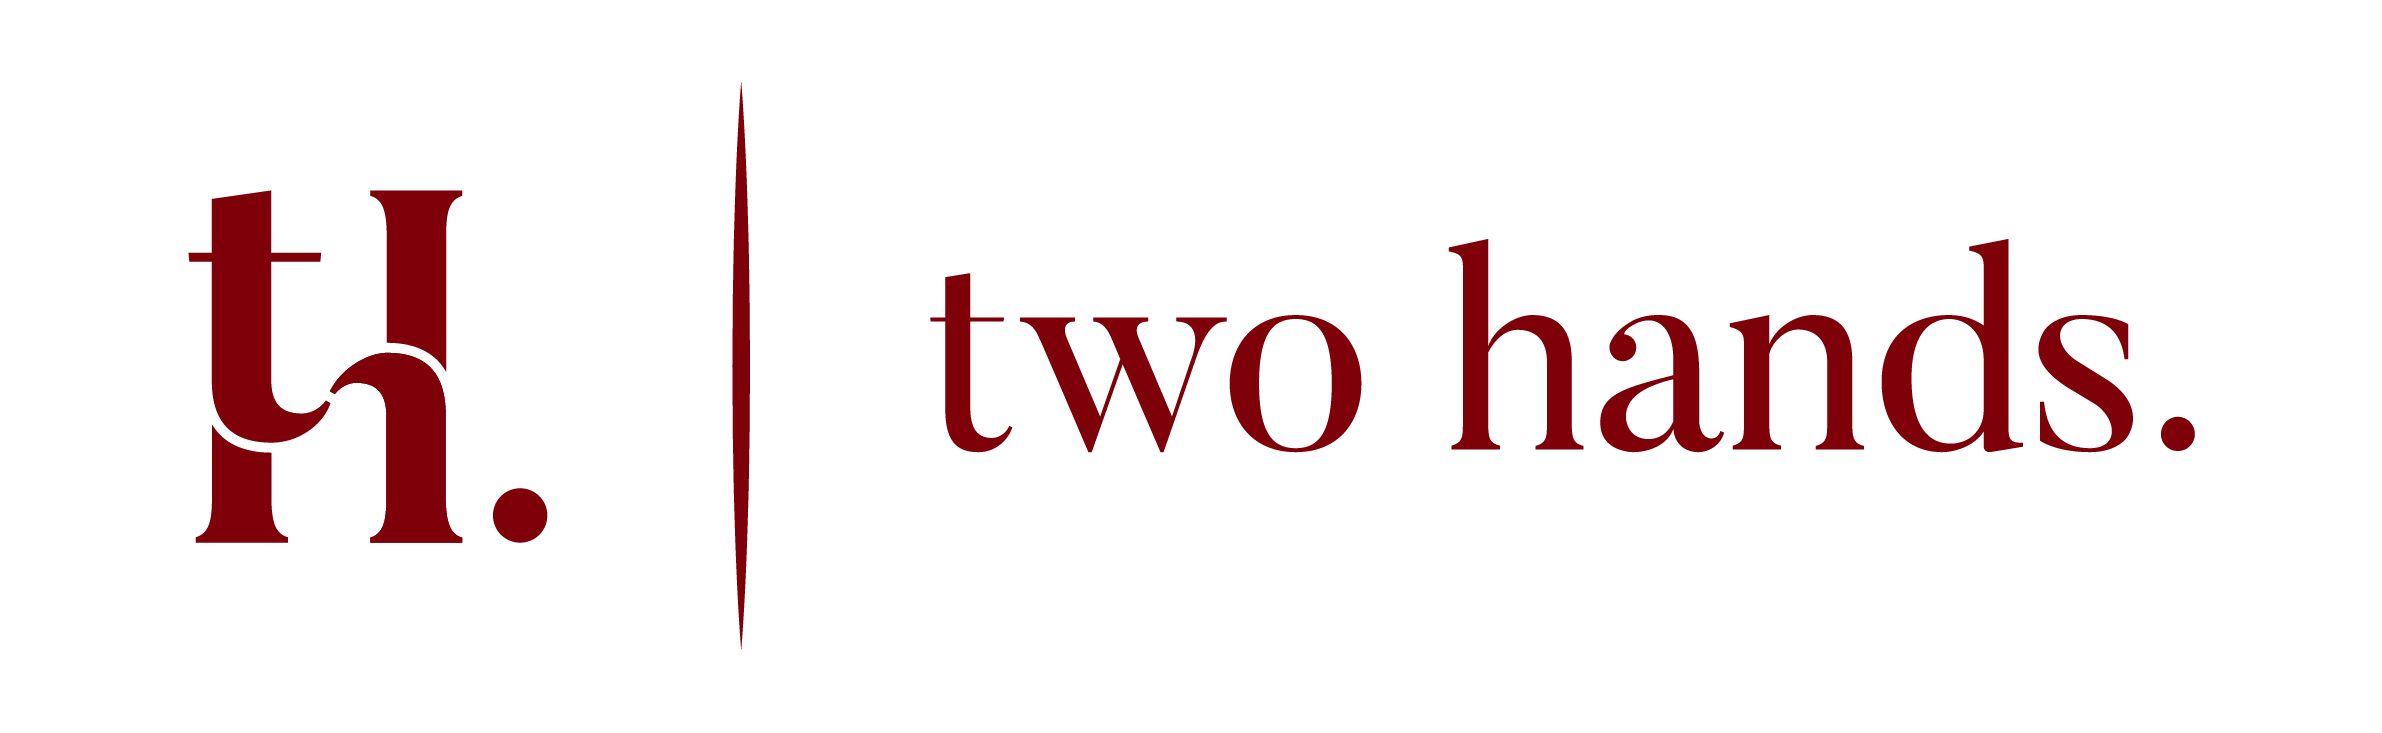 twohands.png